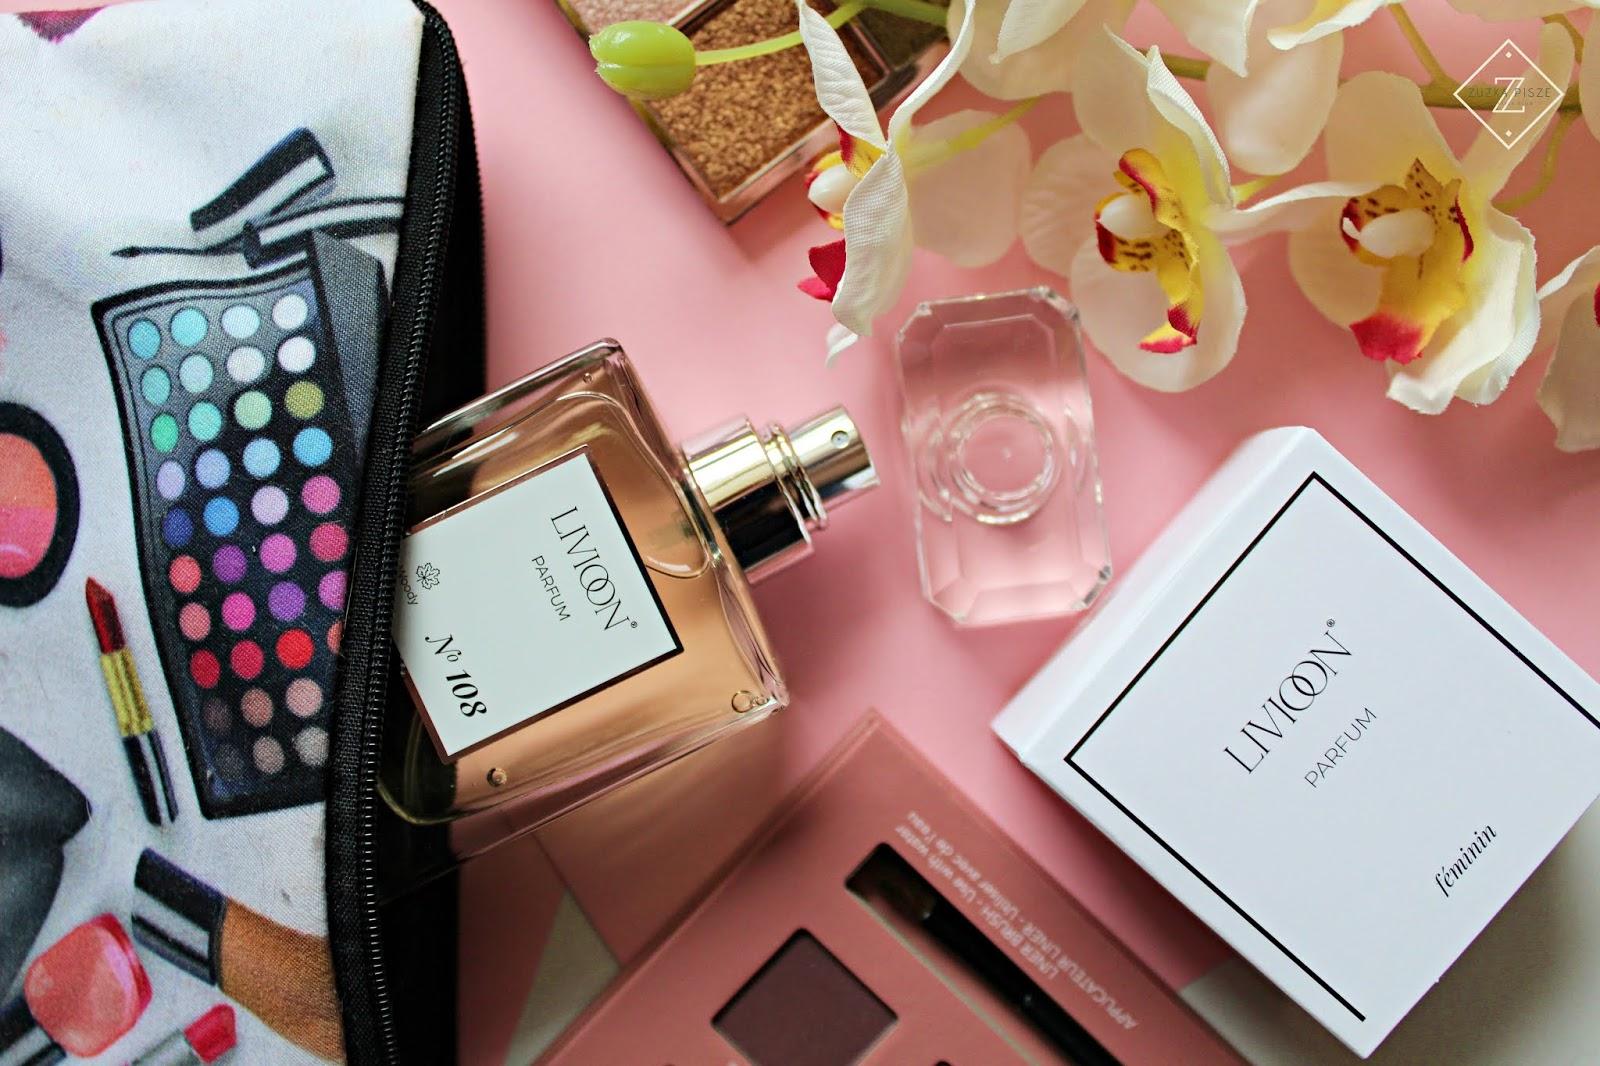 Perfumy pełne magii - LIVIOON no 108